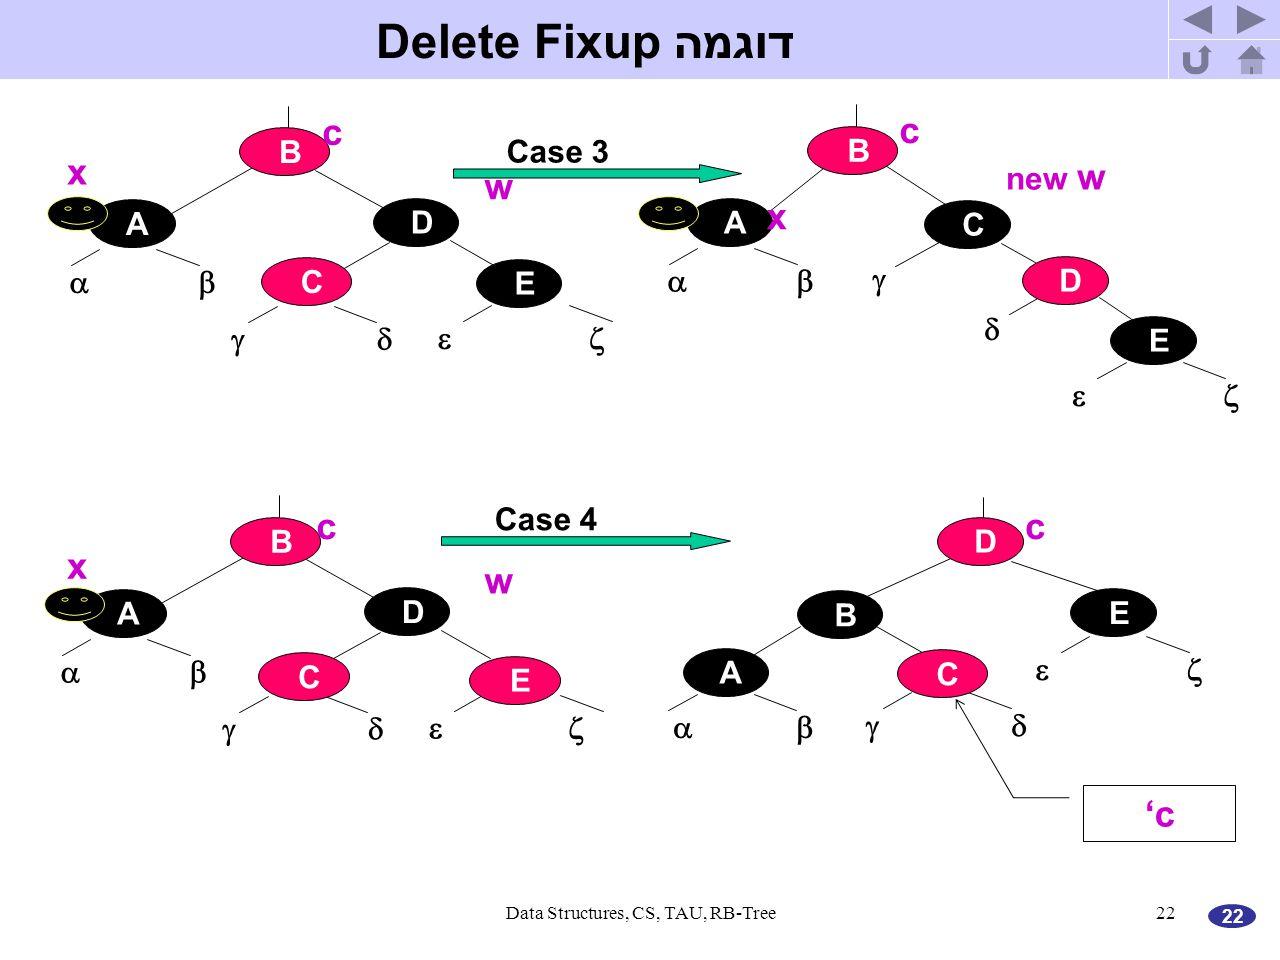 22 Data Structures, CS, TAU, RB-Tree22 דוגמה Delete Fixup A E    Case 3 B D C A E    B D C  x w c x new w c A    B D Case 4 C E E    A D B C x w cc 'c